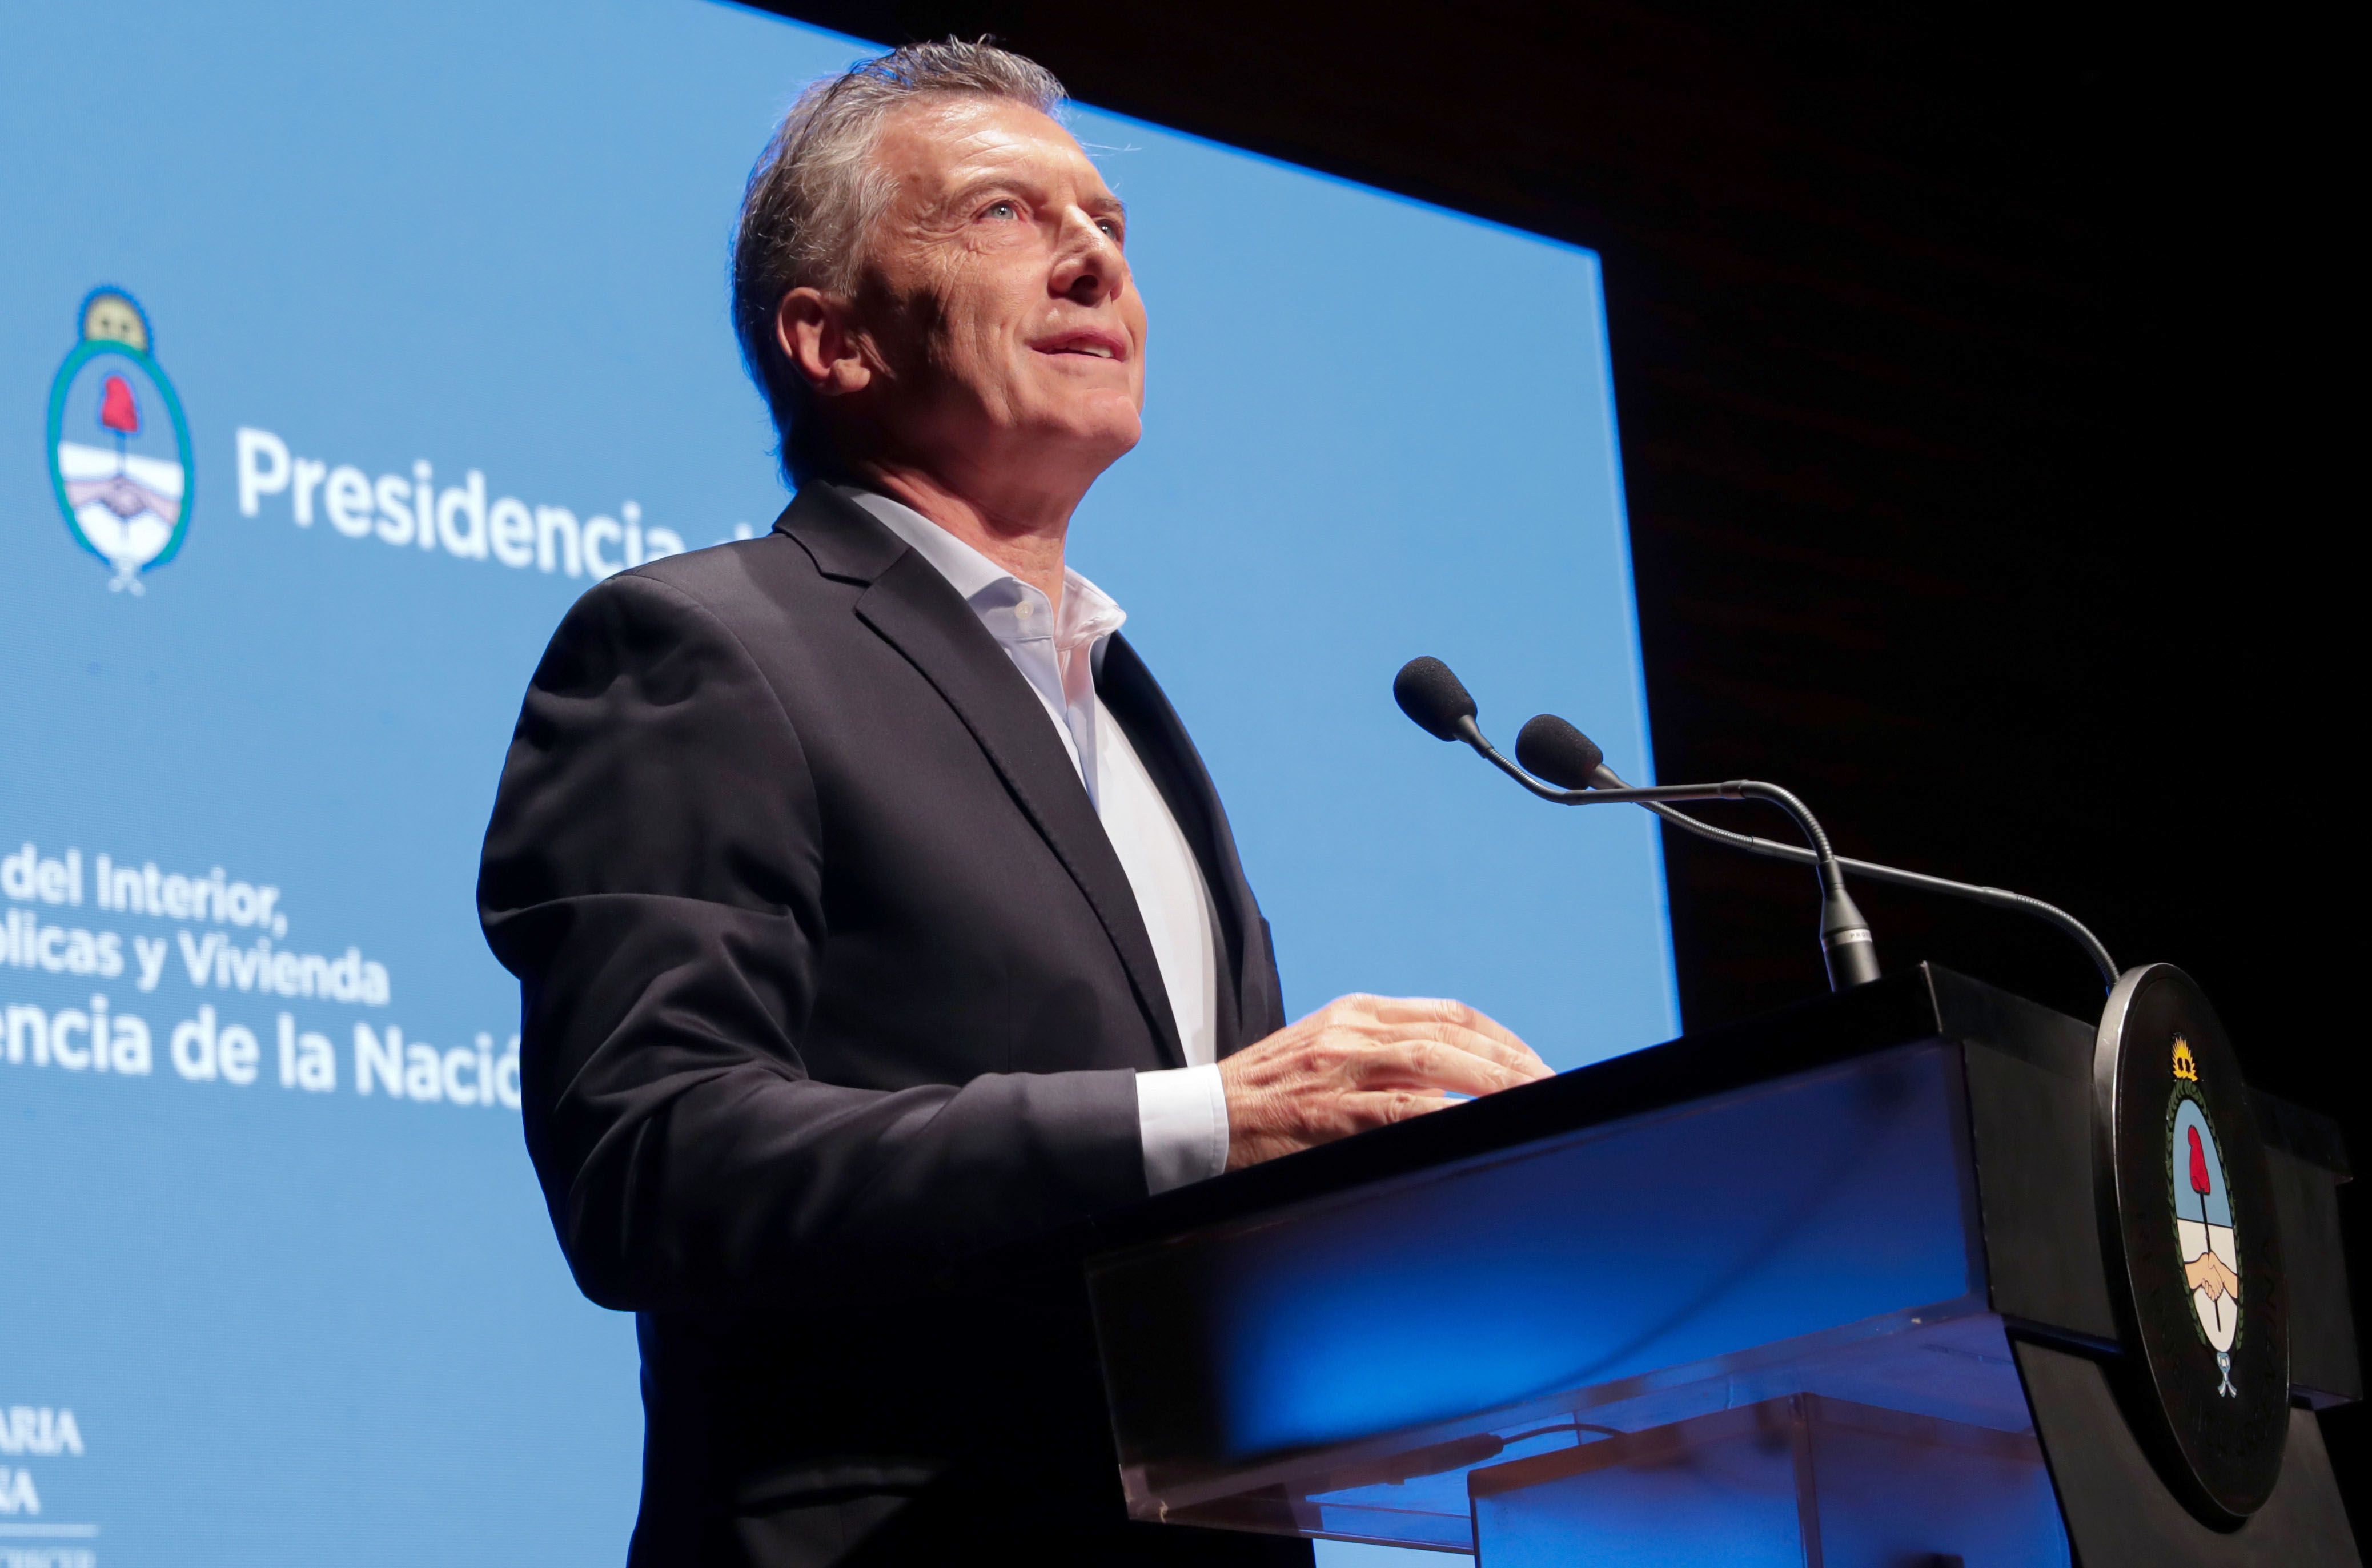 Revés para Macri en la causa penal de Correo Argentino: rechazan planteos para anular el caso